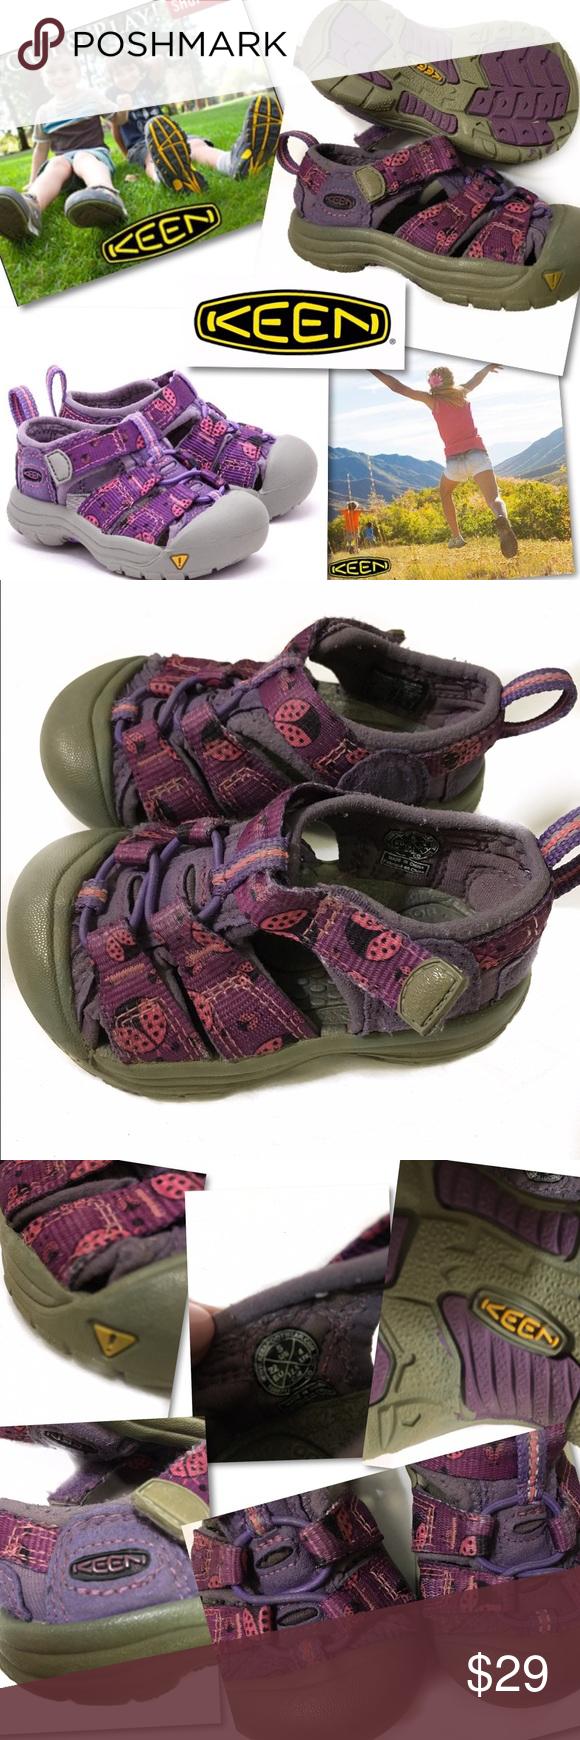 hugo boss shoes baymax tsum